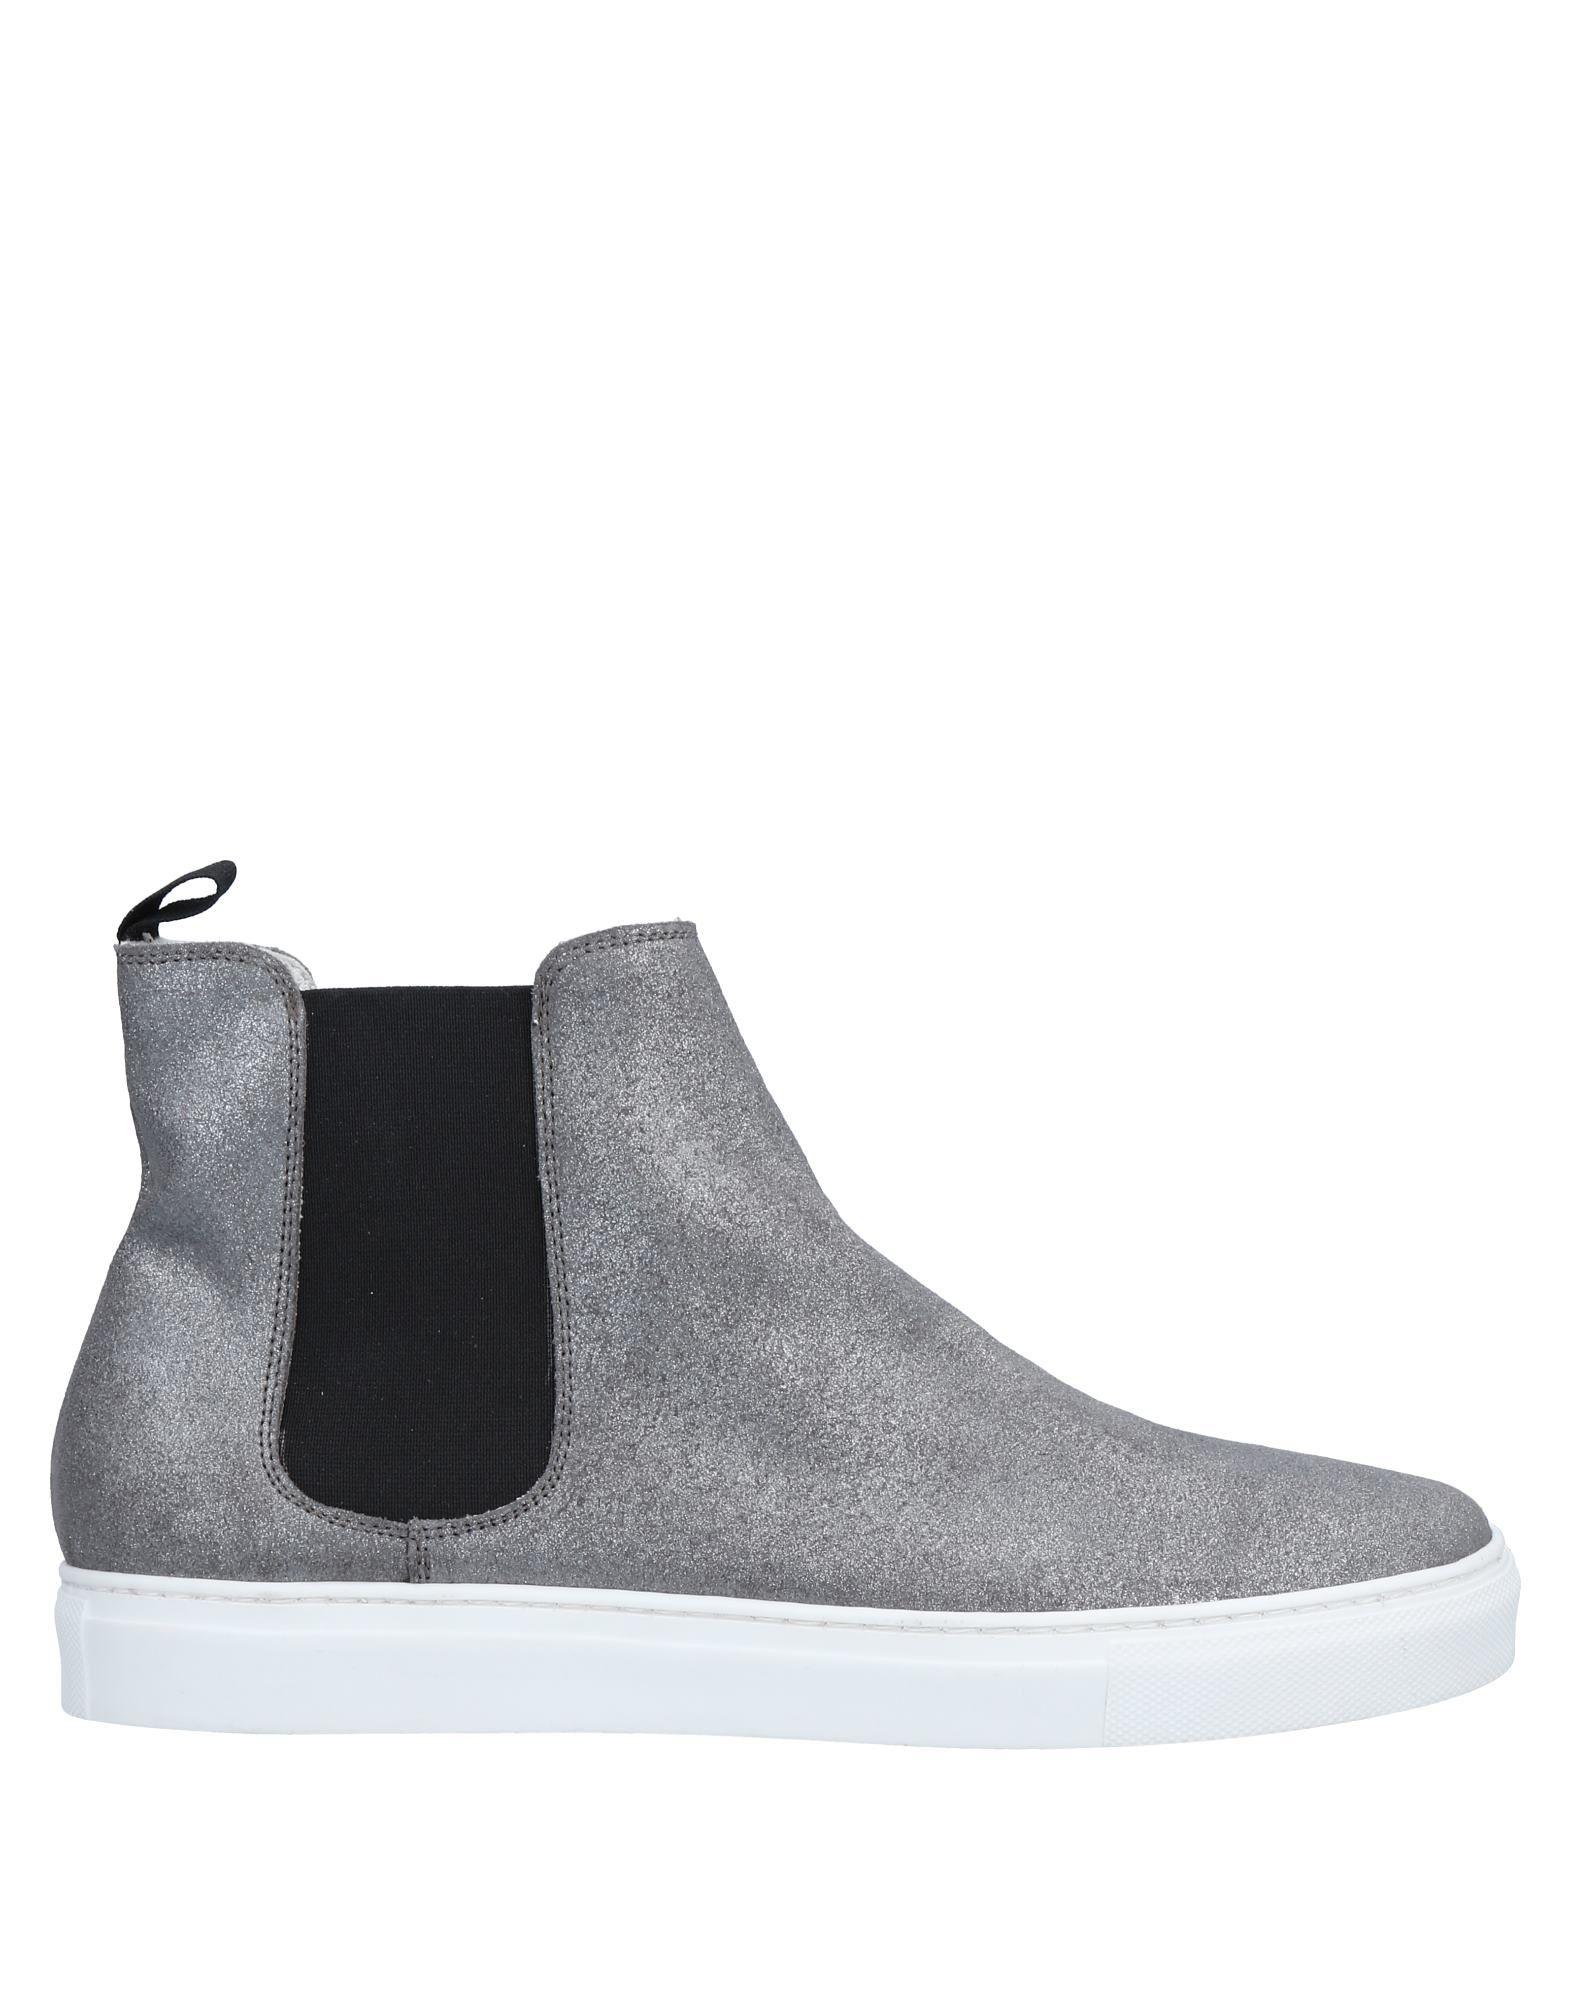 White Millan Sneakers Sneakers - Men White Millan Sneakers Sneakers online on  Canada - 11575068VQ 92f989